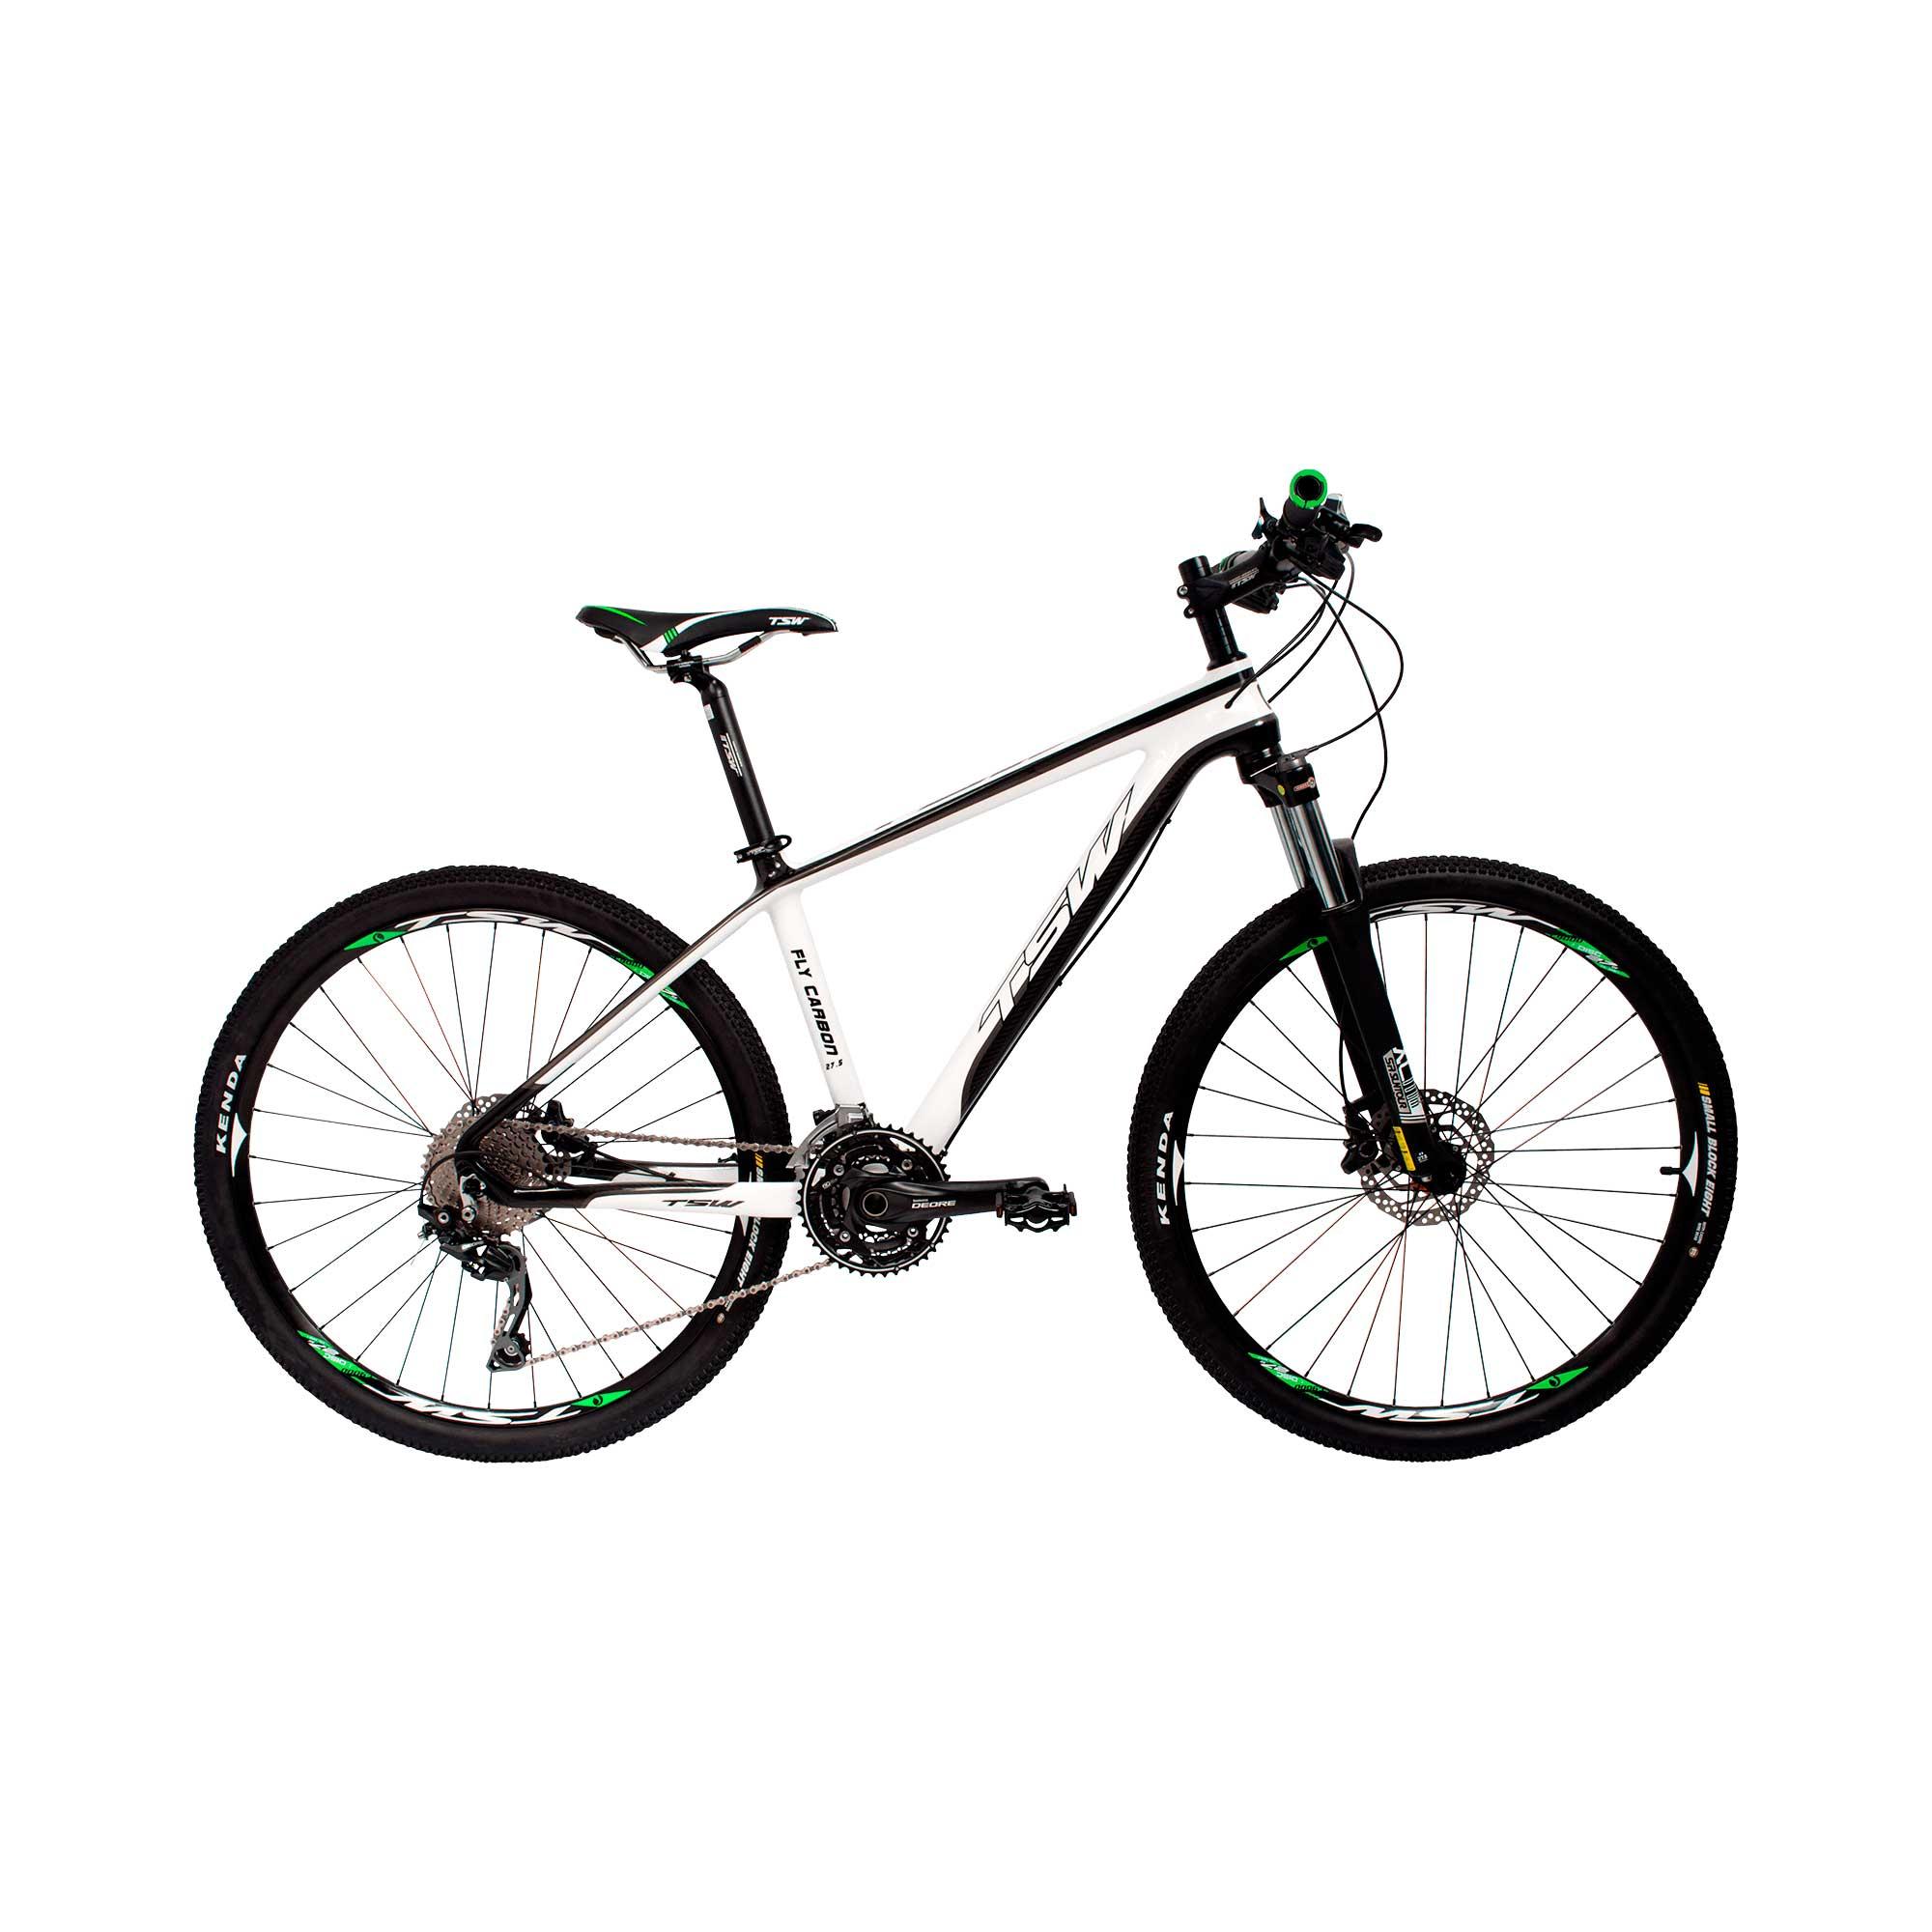 7b3a4cdab9 Bicicleta Mountain Bike TSW FLY Carbon 2016 aro 27.5 30V marchas ...